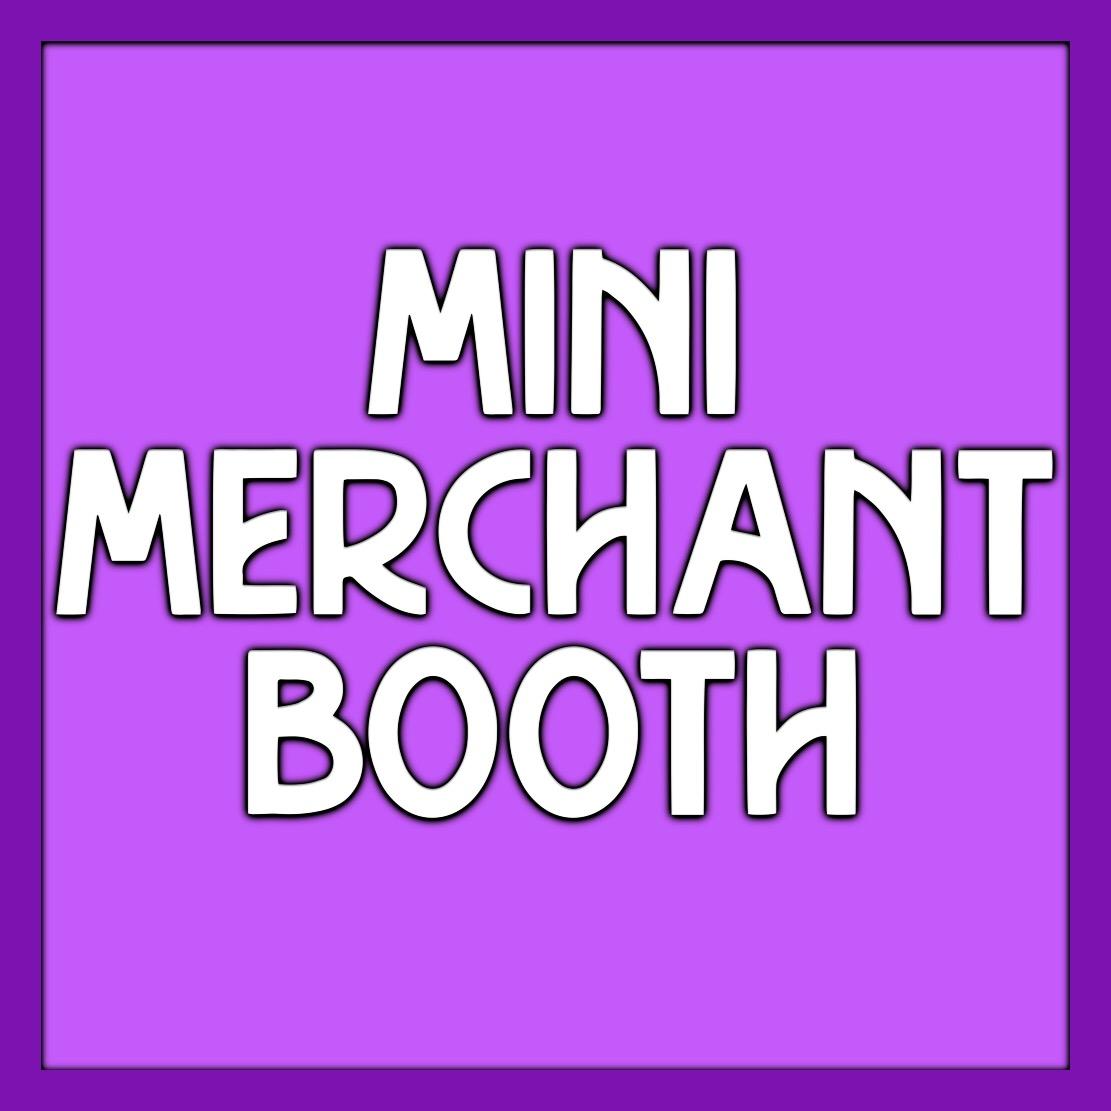 Oahu Corner Merchant Booth